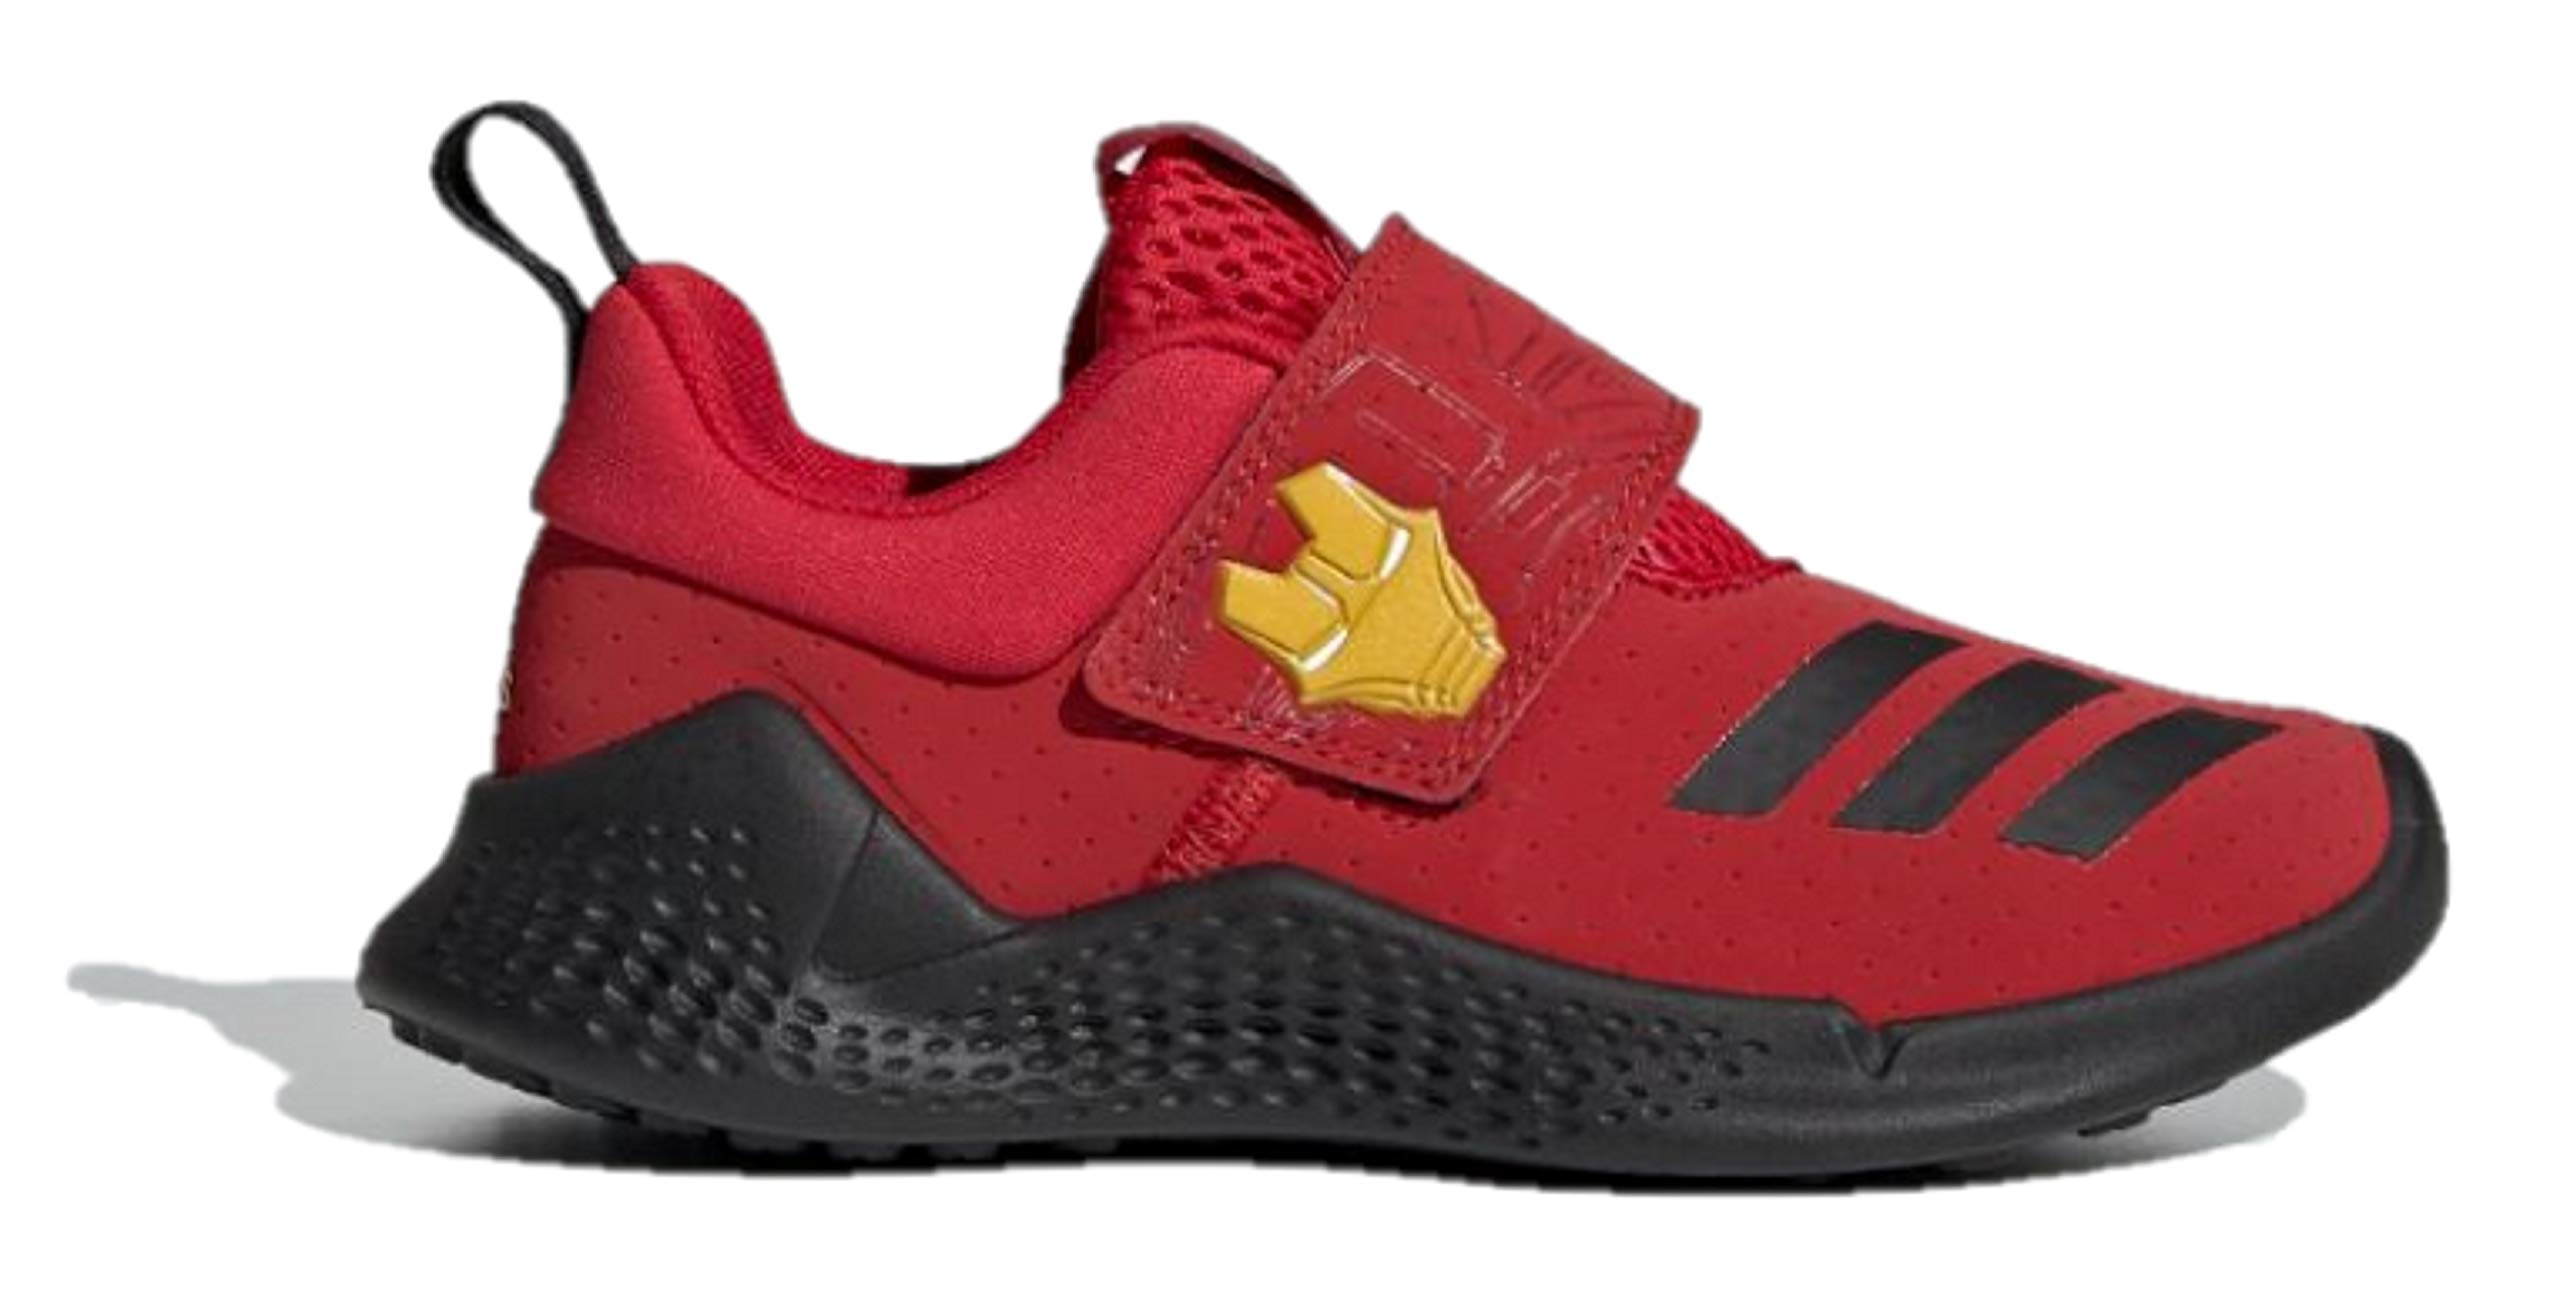 adidas Unisex Kids RapidaBounce Training Marvel Avengers C Limited Edition Sneakers (11.5 M US Little Kid, Scarlet/Core Black/Bold Gold)